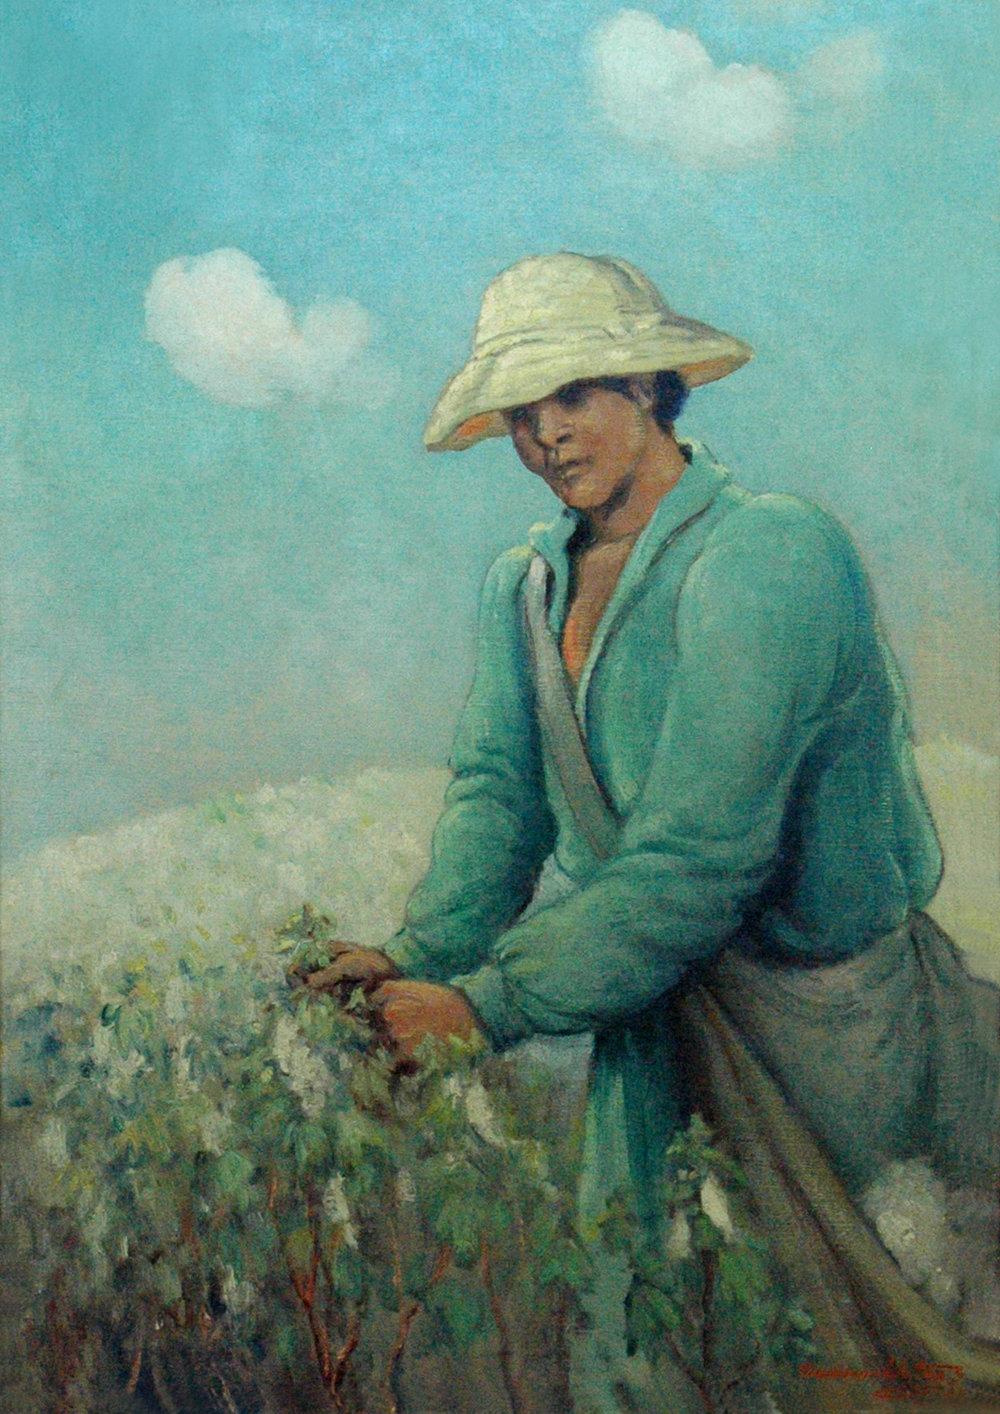 Cotton Picker, 34 x 24, oil on canvas